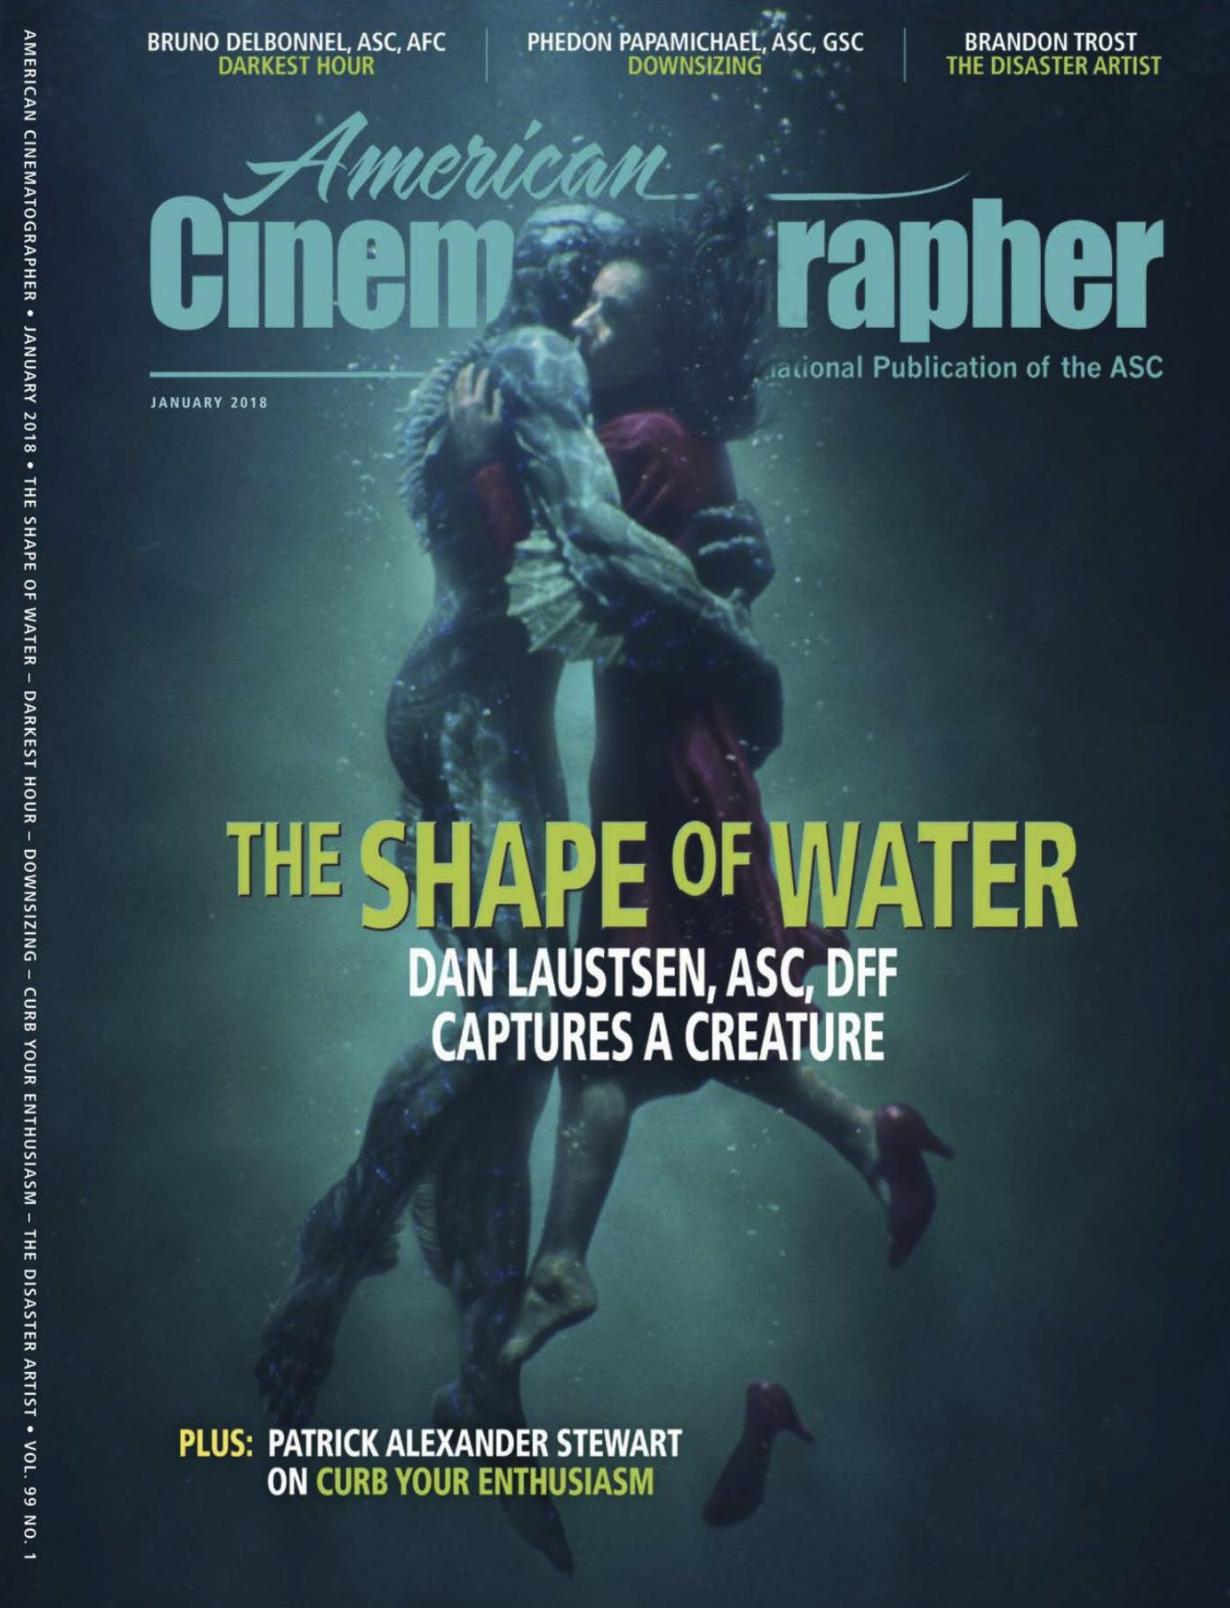 press - AMERICAN CINEMATOGRAPHER MAGAZINE